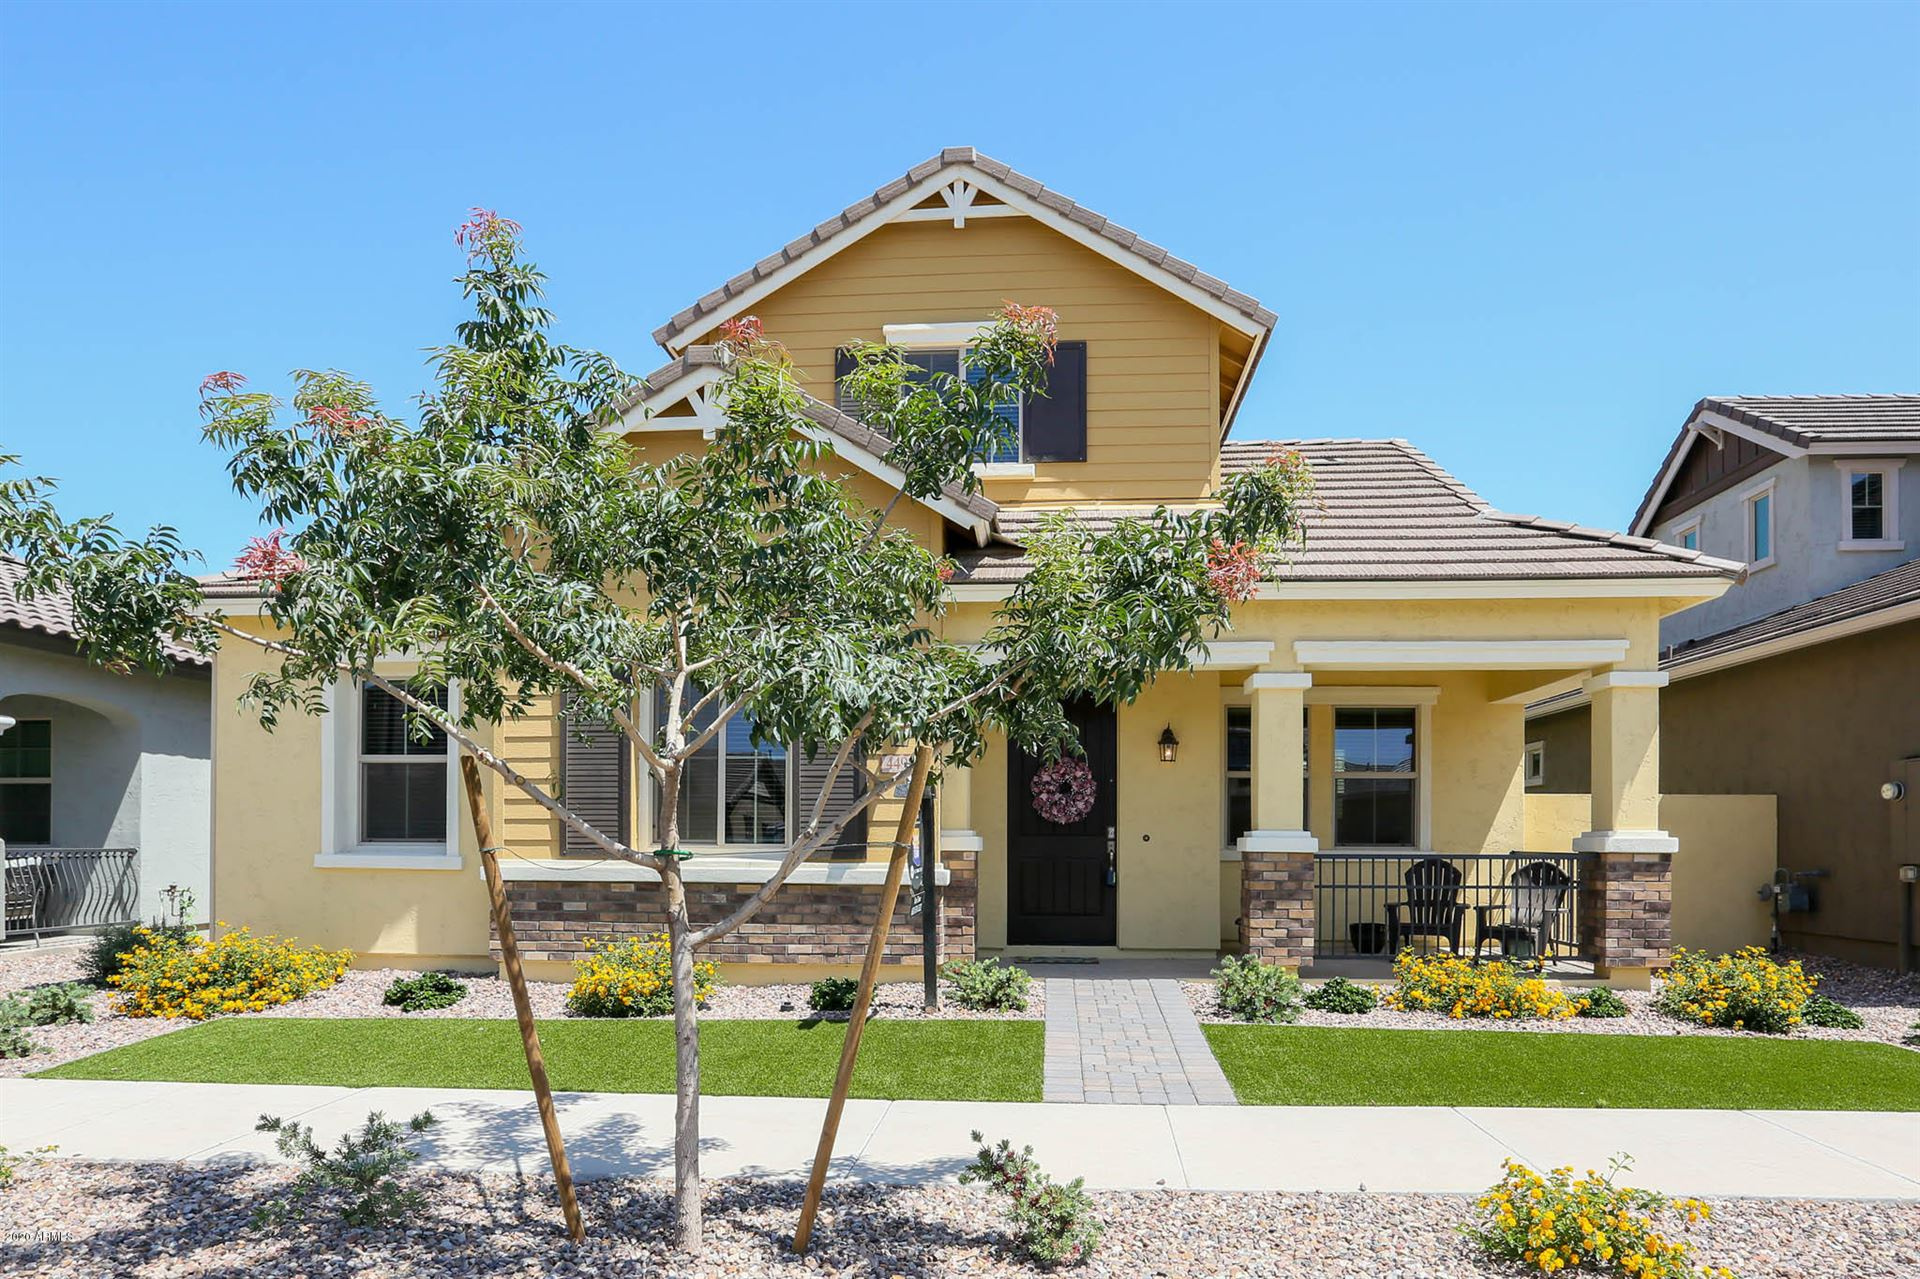 4498 E BETHENA Street, Gilbert, AZ 85295 - #: 6098812